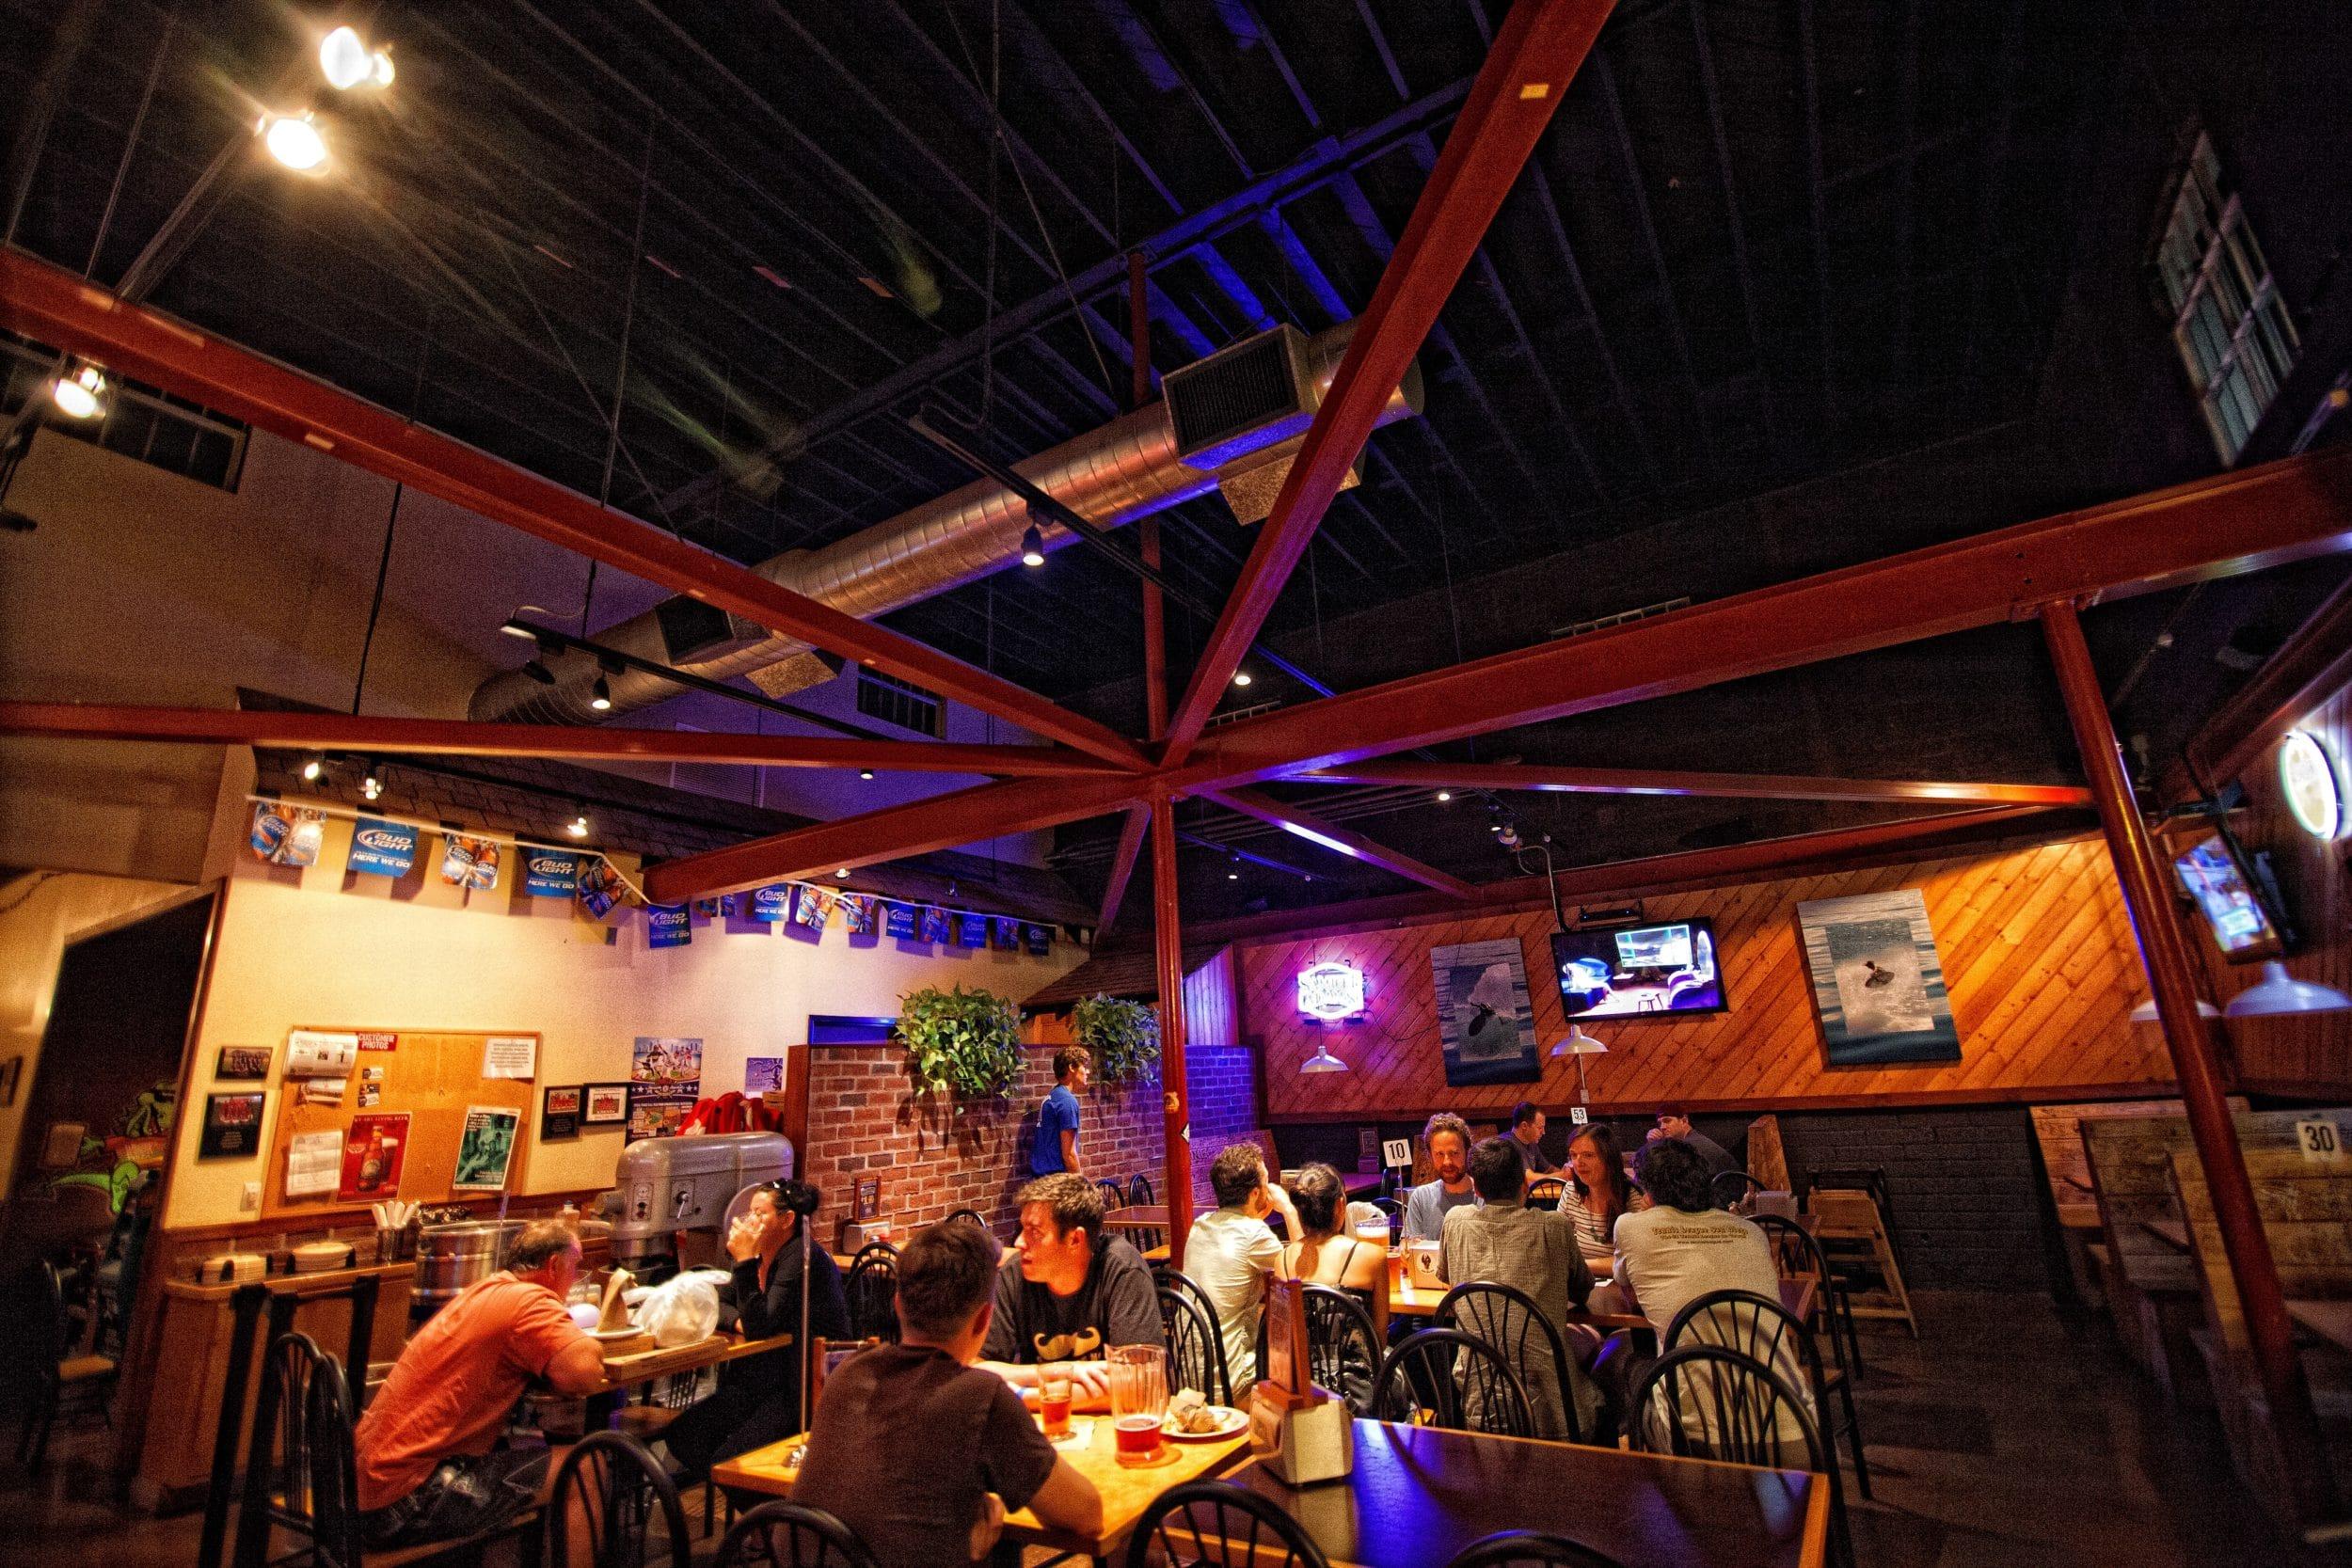 Woodstock's Pizza, a Pacific Beach restaurant